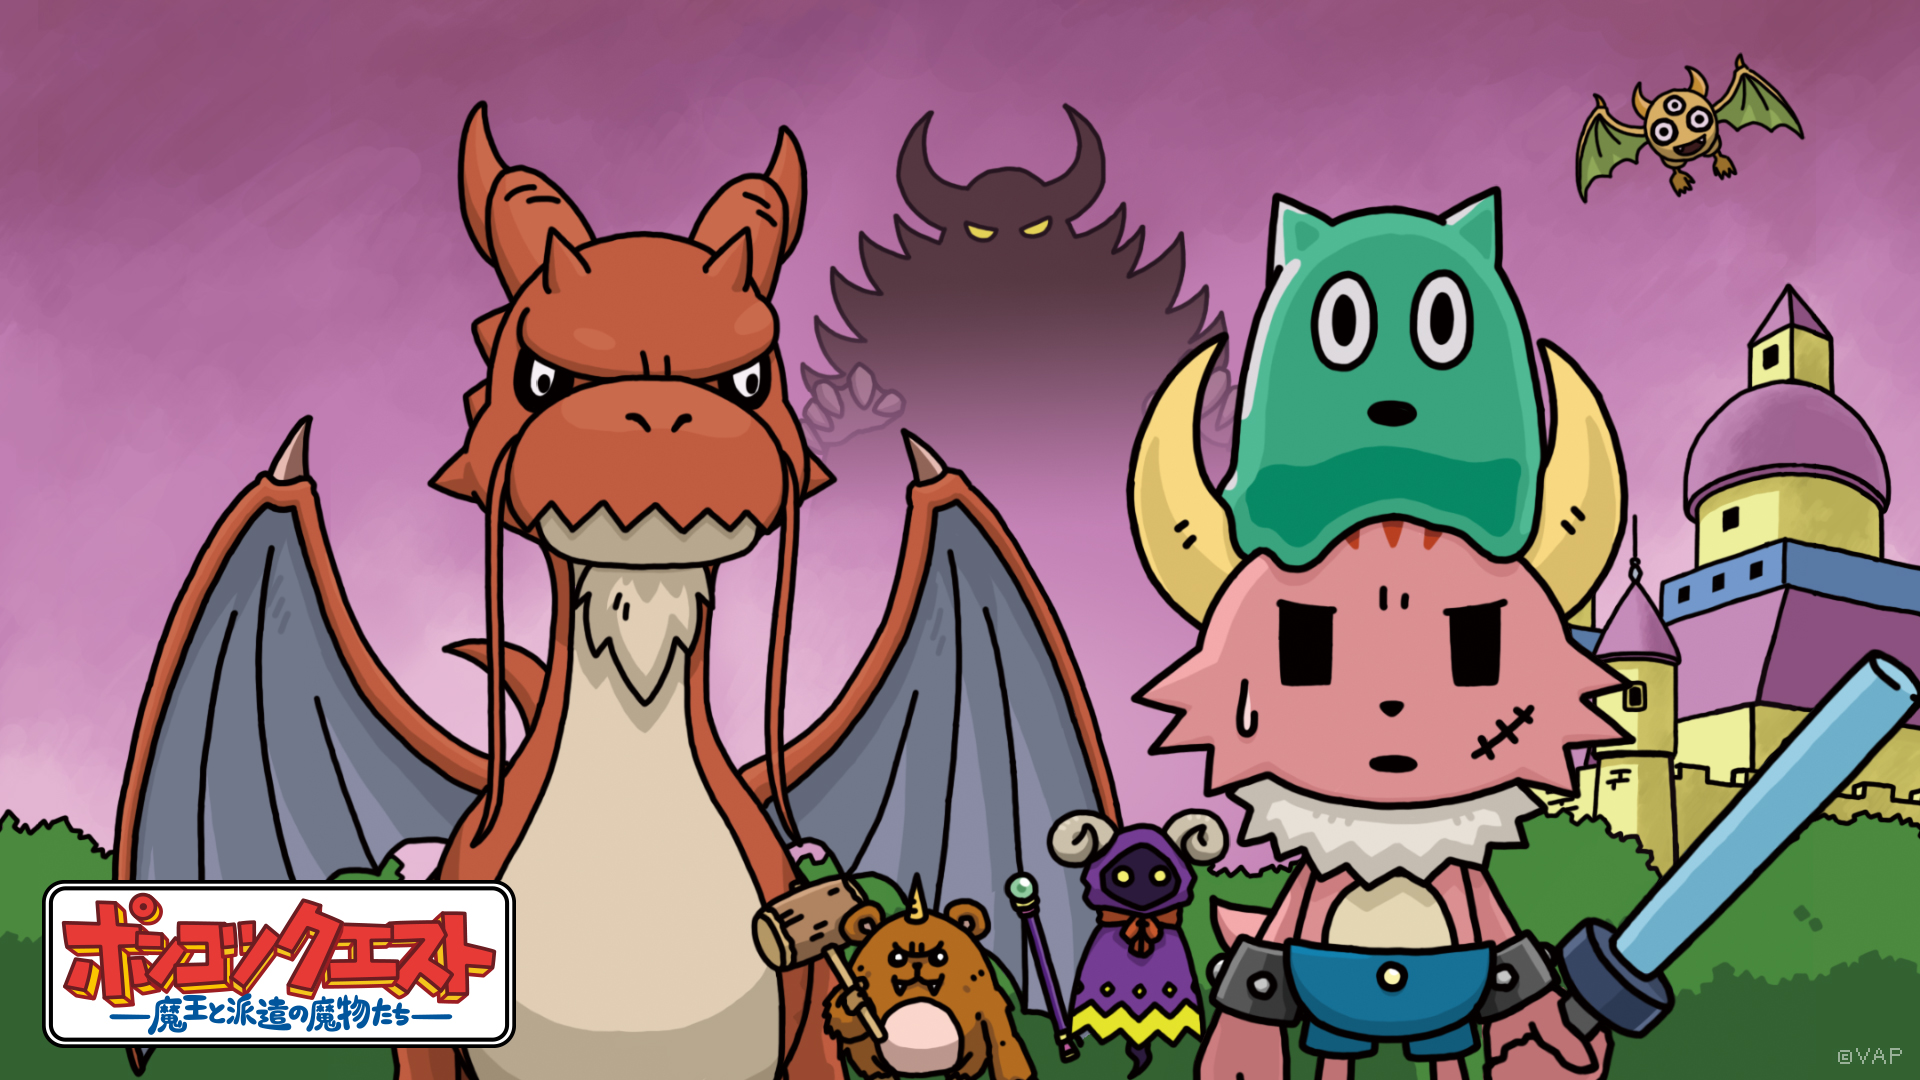 Special ポンコツクエスト 魔王と派遣の魔物たち 公式サイト Vap